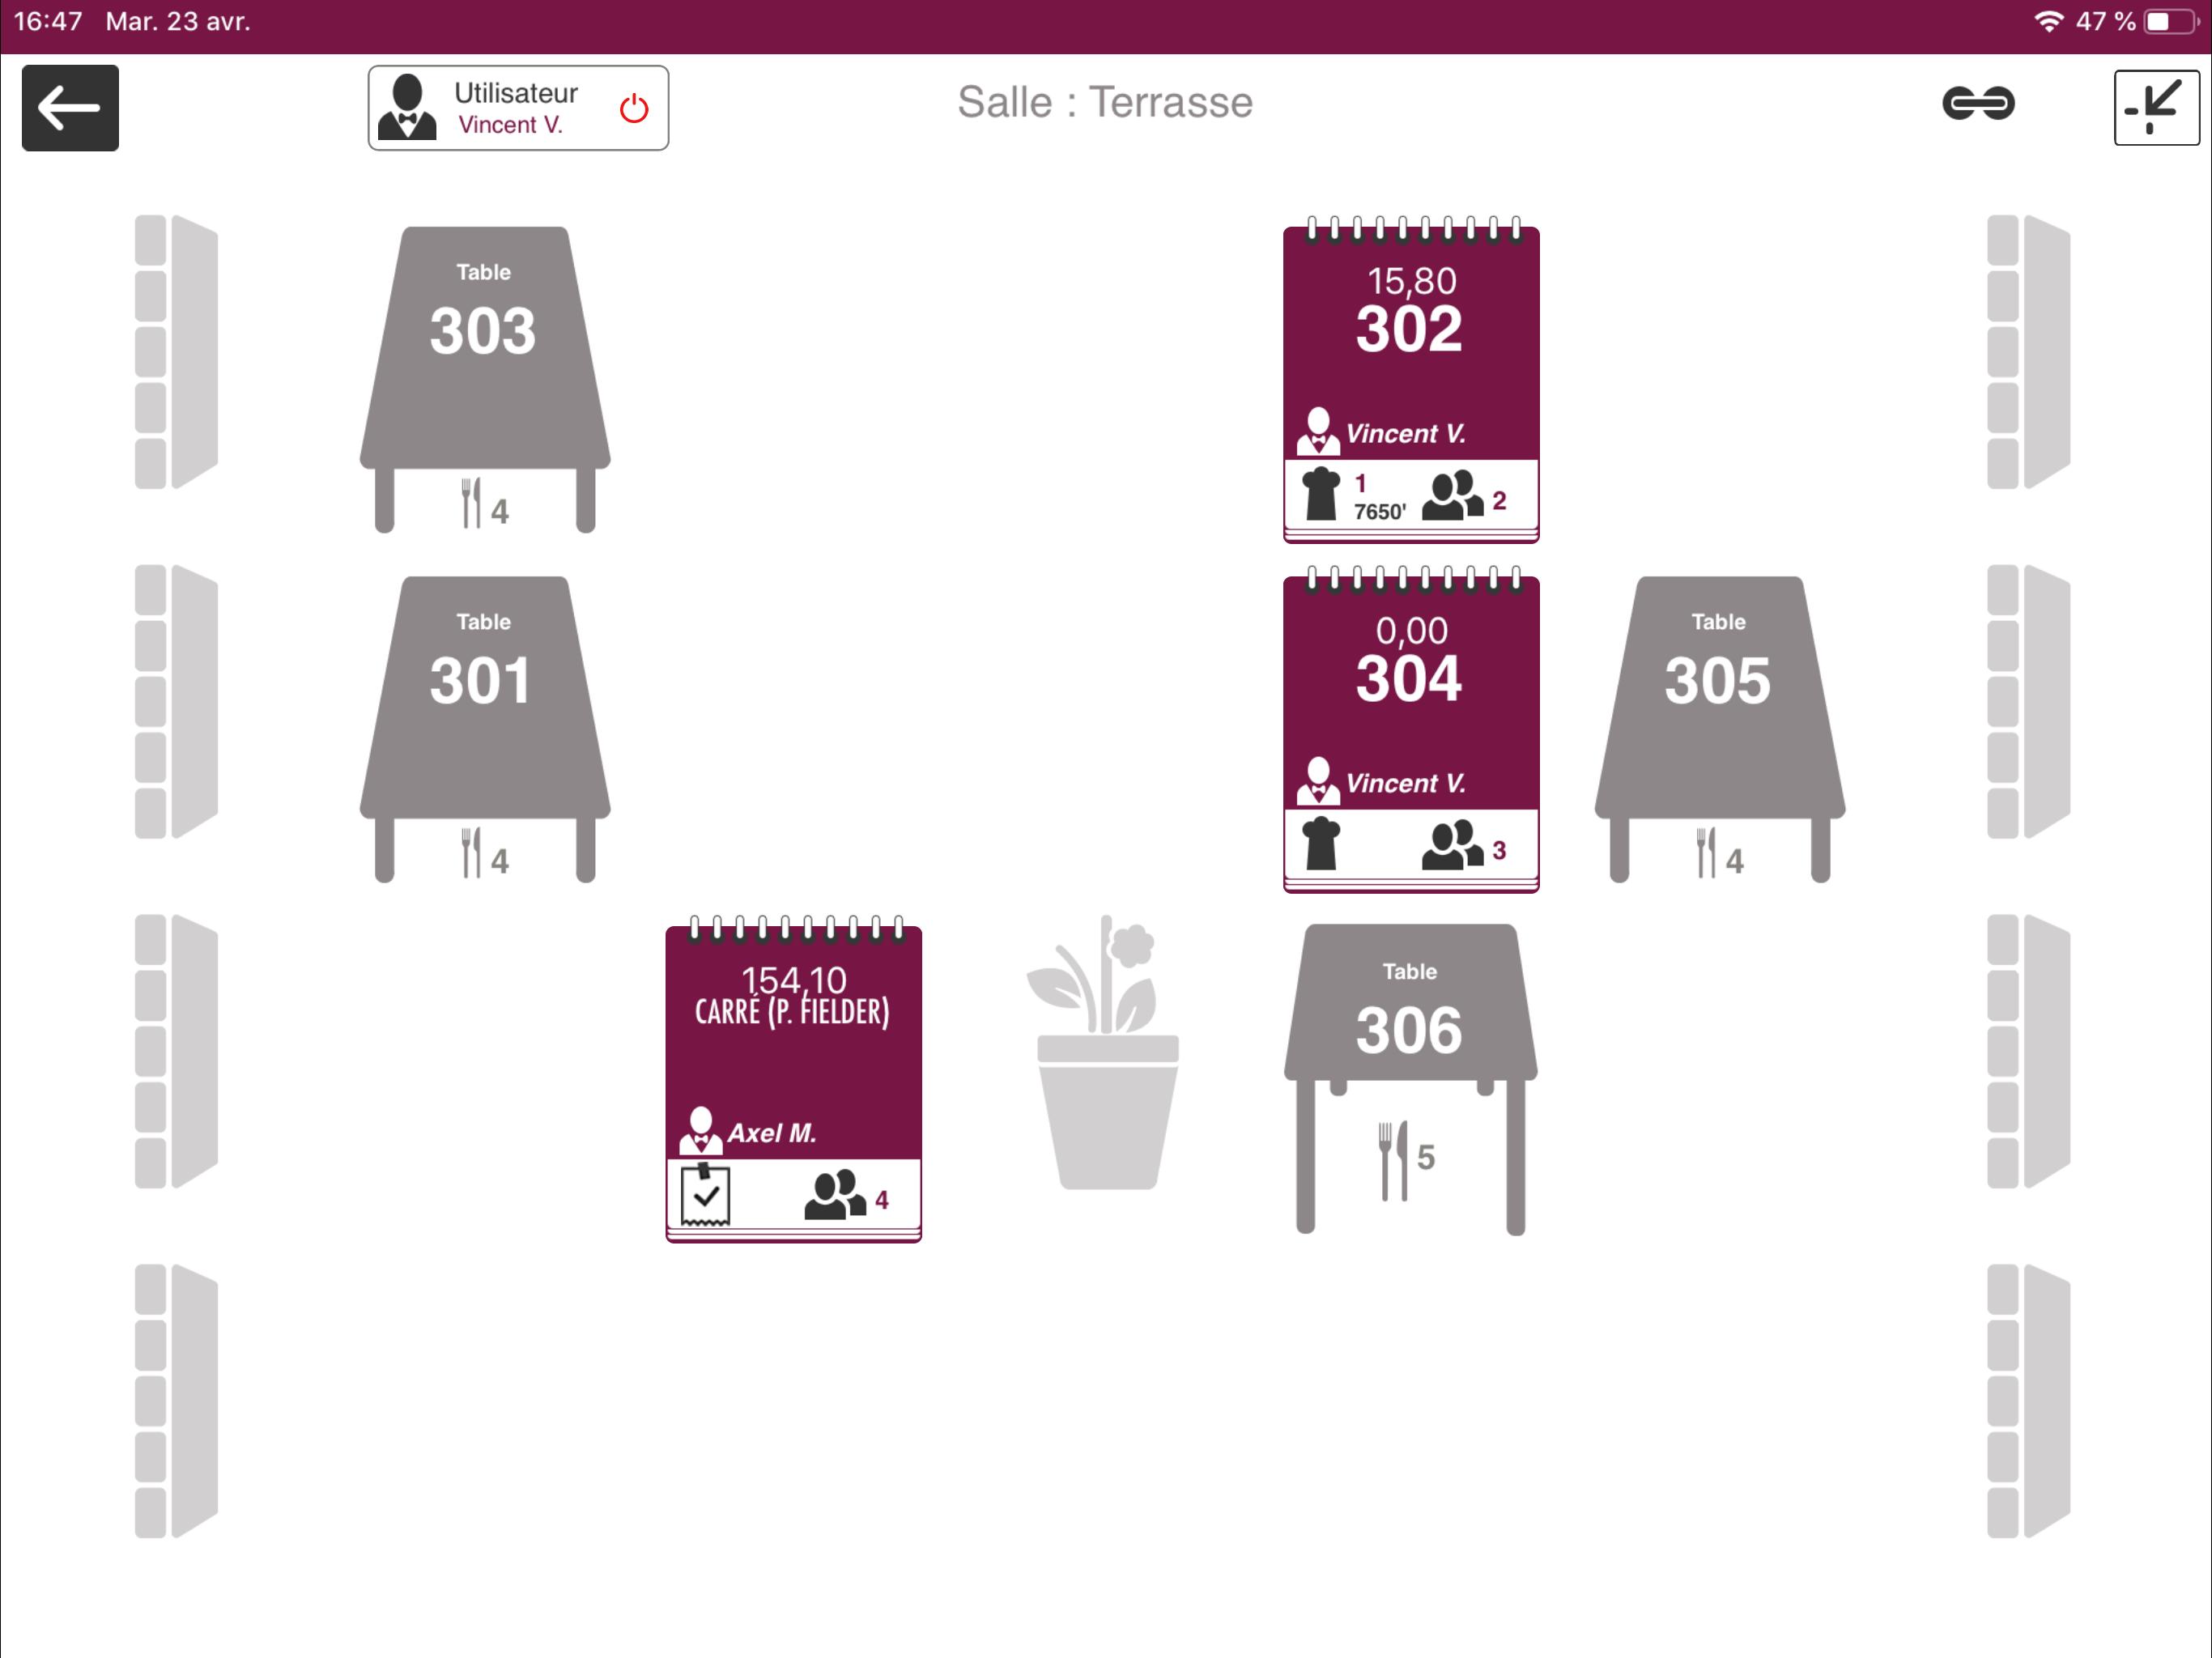 Gestion restaurant : plan de salle L'Addition